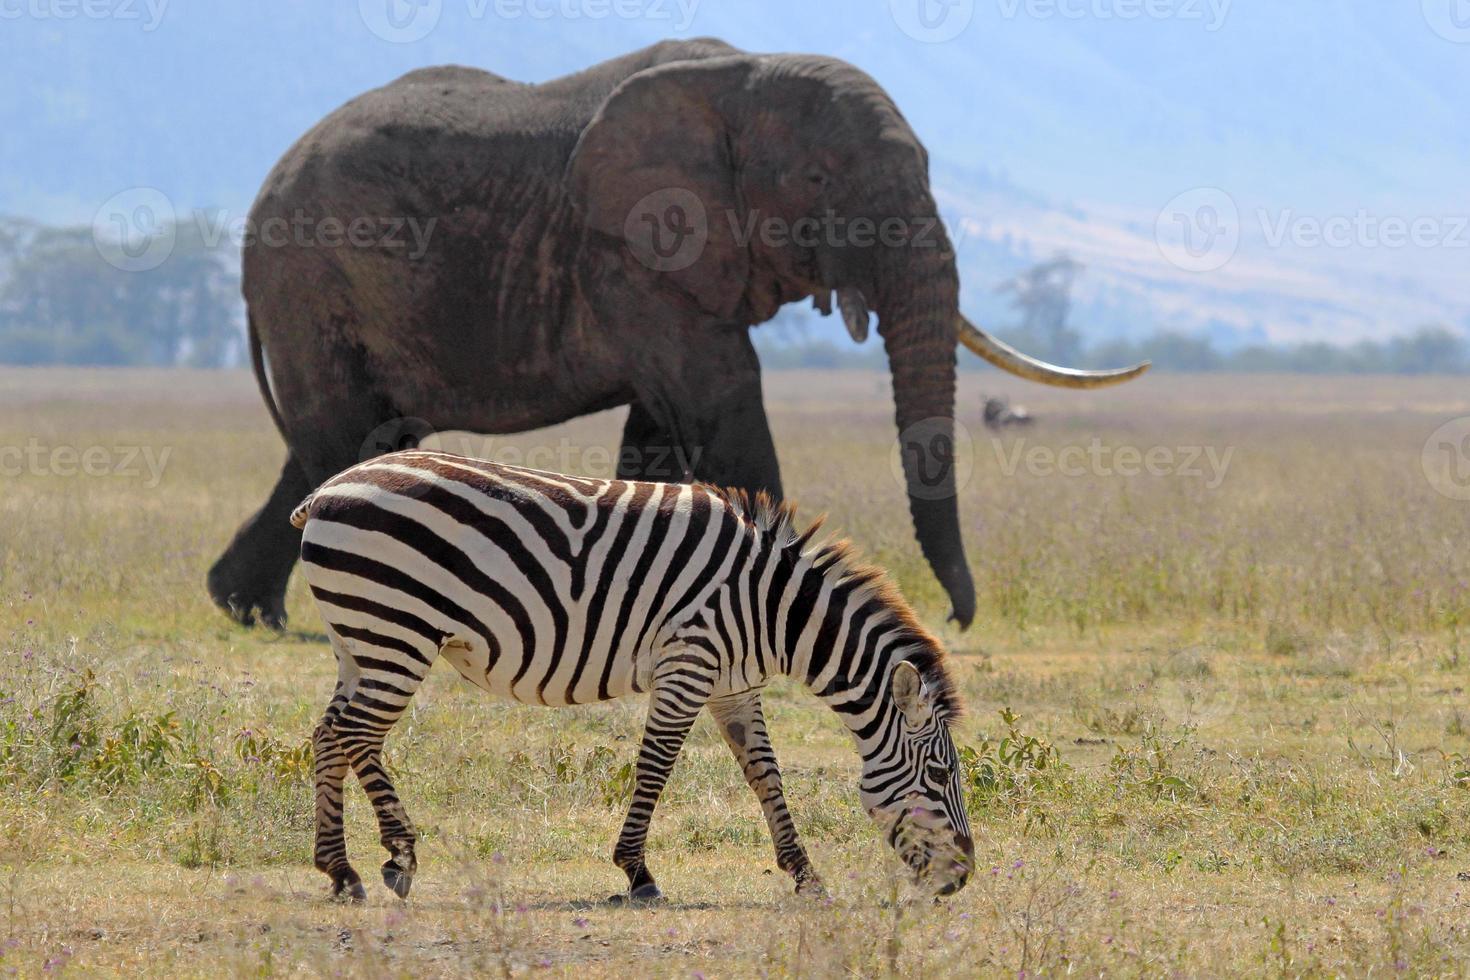 zebra e elefante africano foto